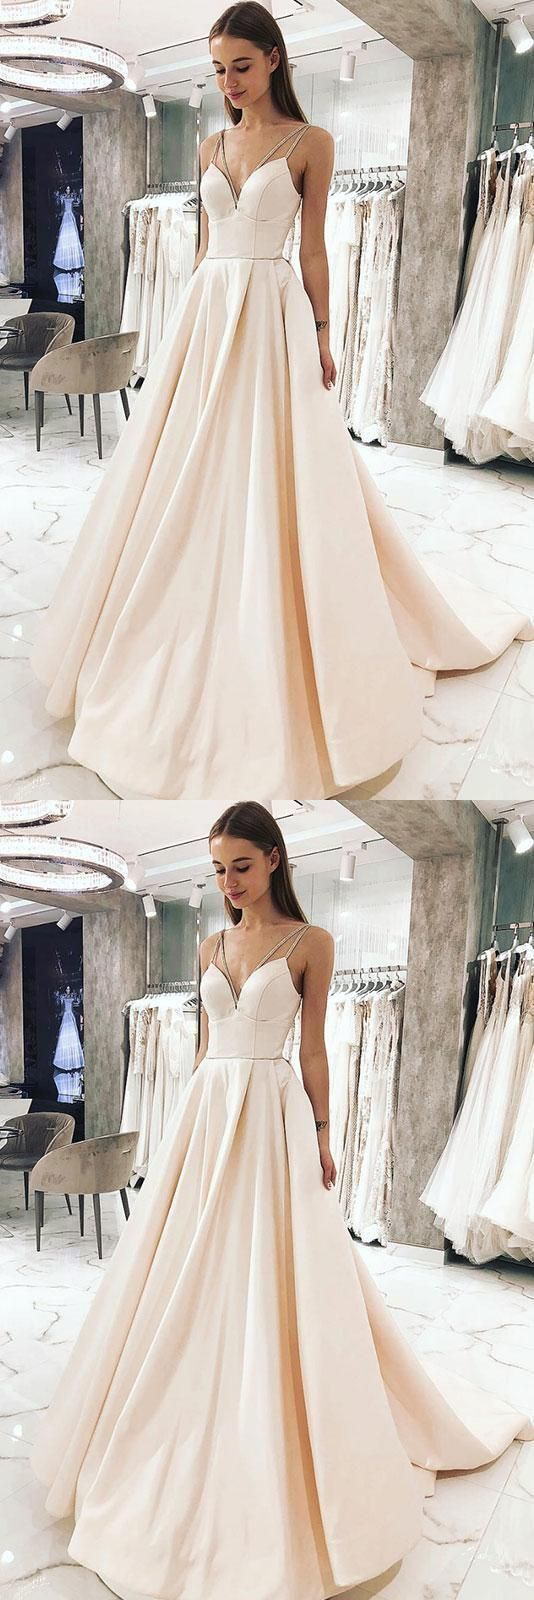 Charming simple v neck champagne satin long prom dress, spaghetti straps simple